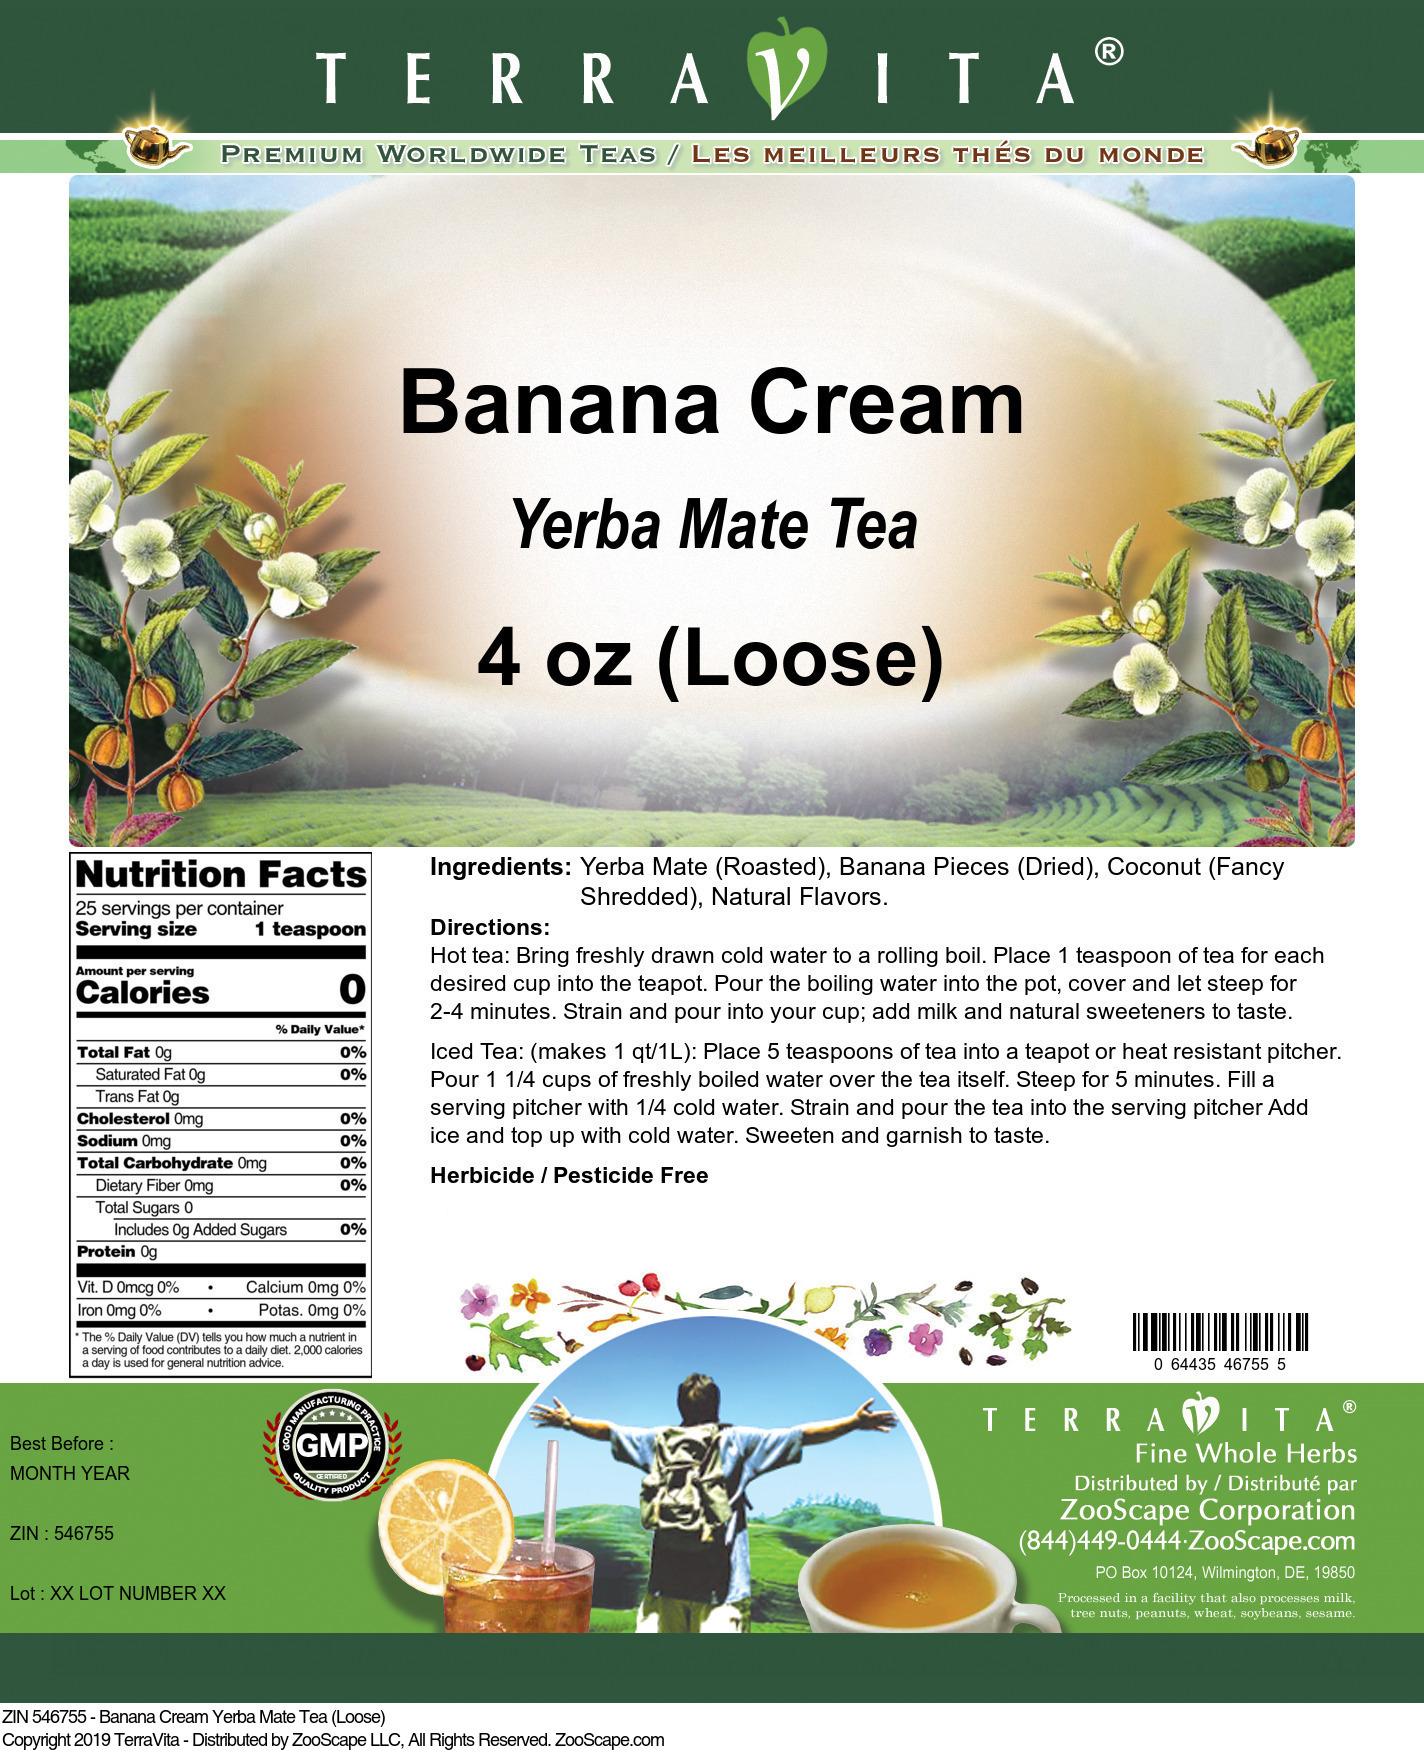 Banana Cream Yerba Mate Tea (Loose)